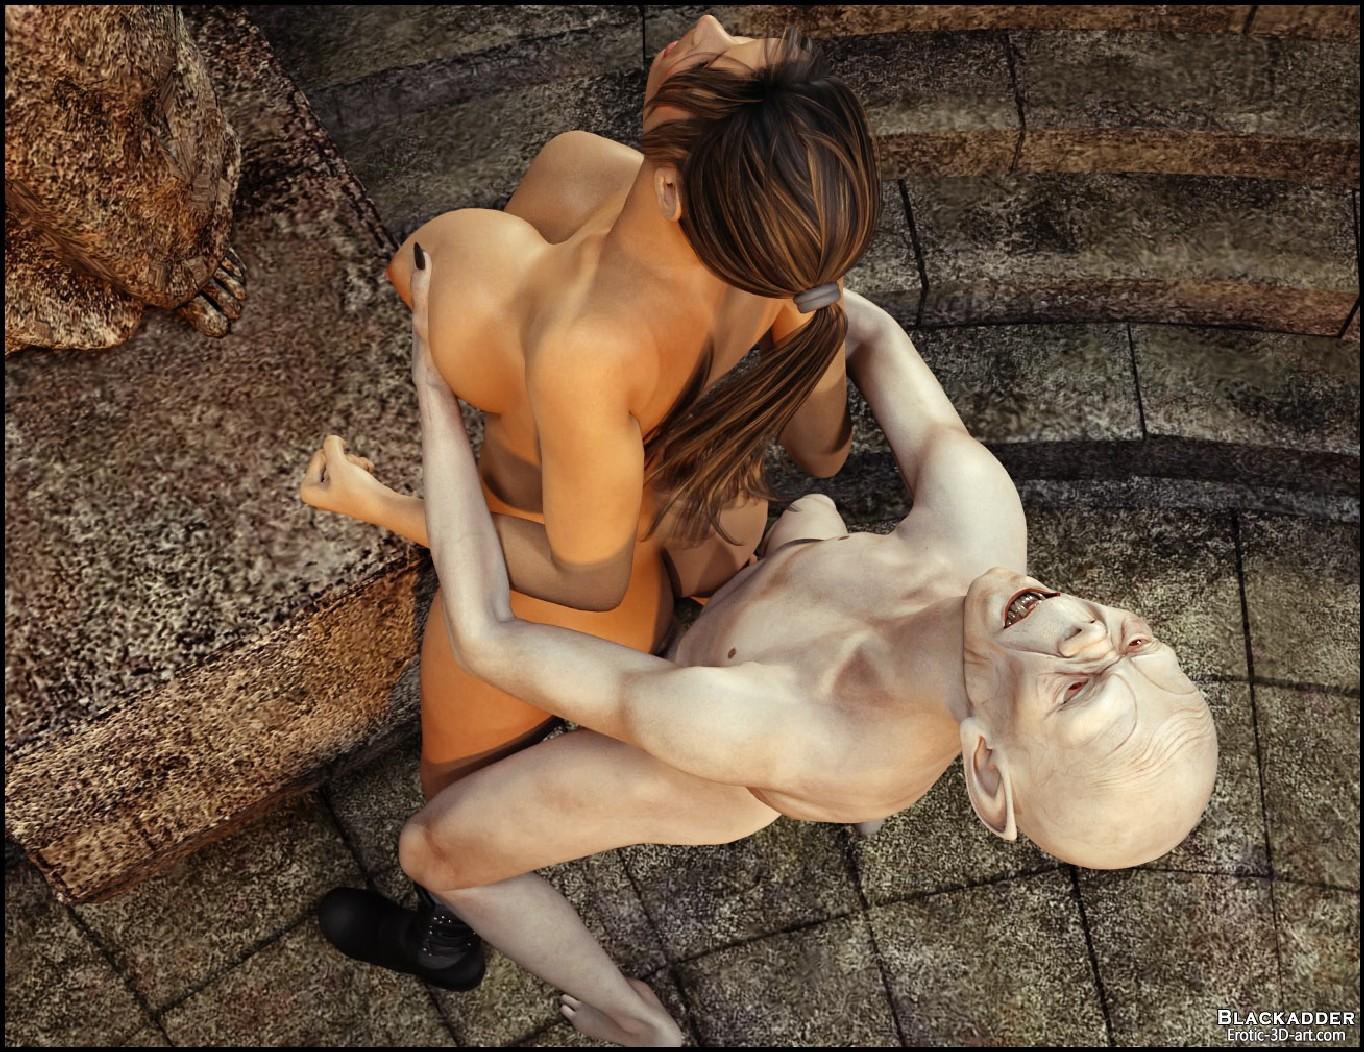 foto-obnazhennih-golih-devushek-erotika